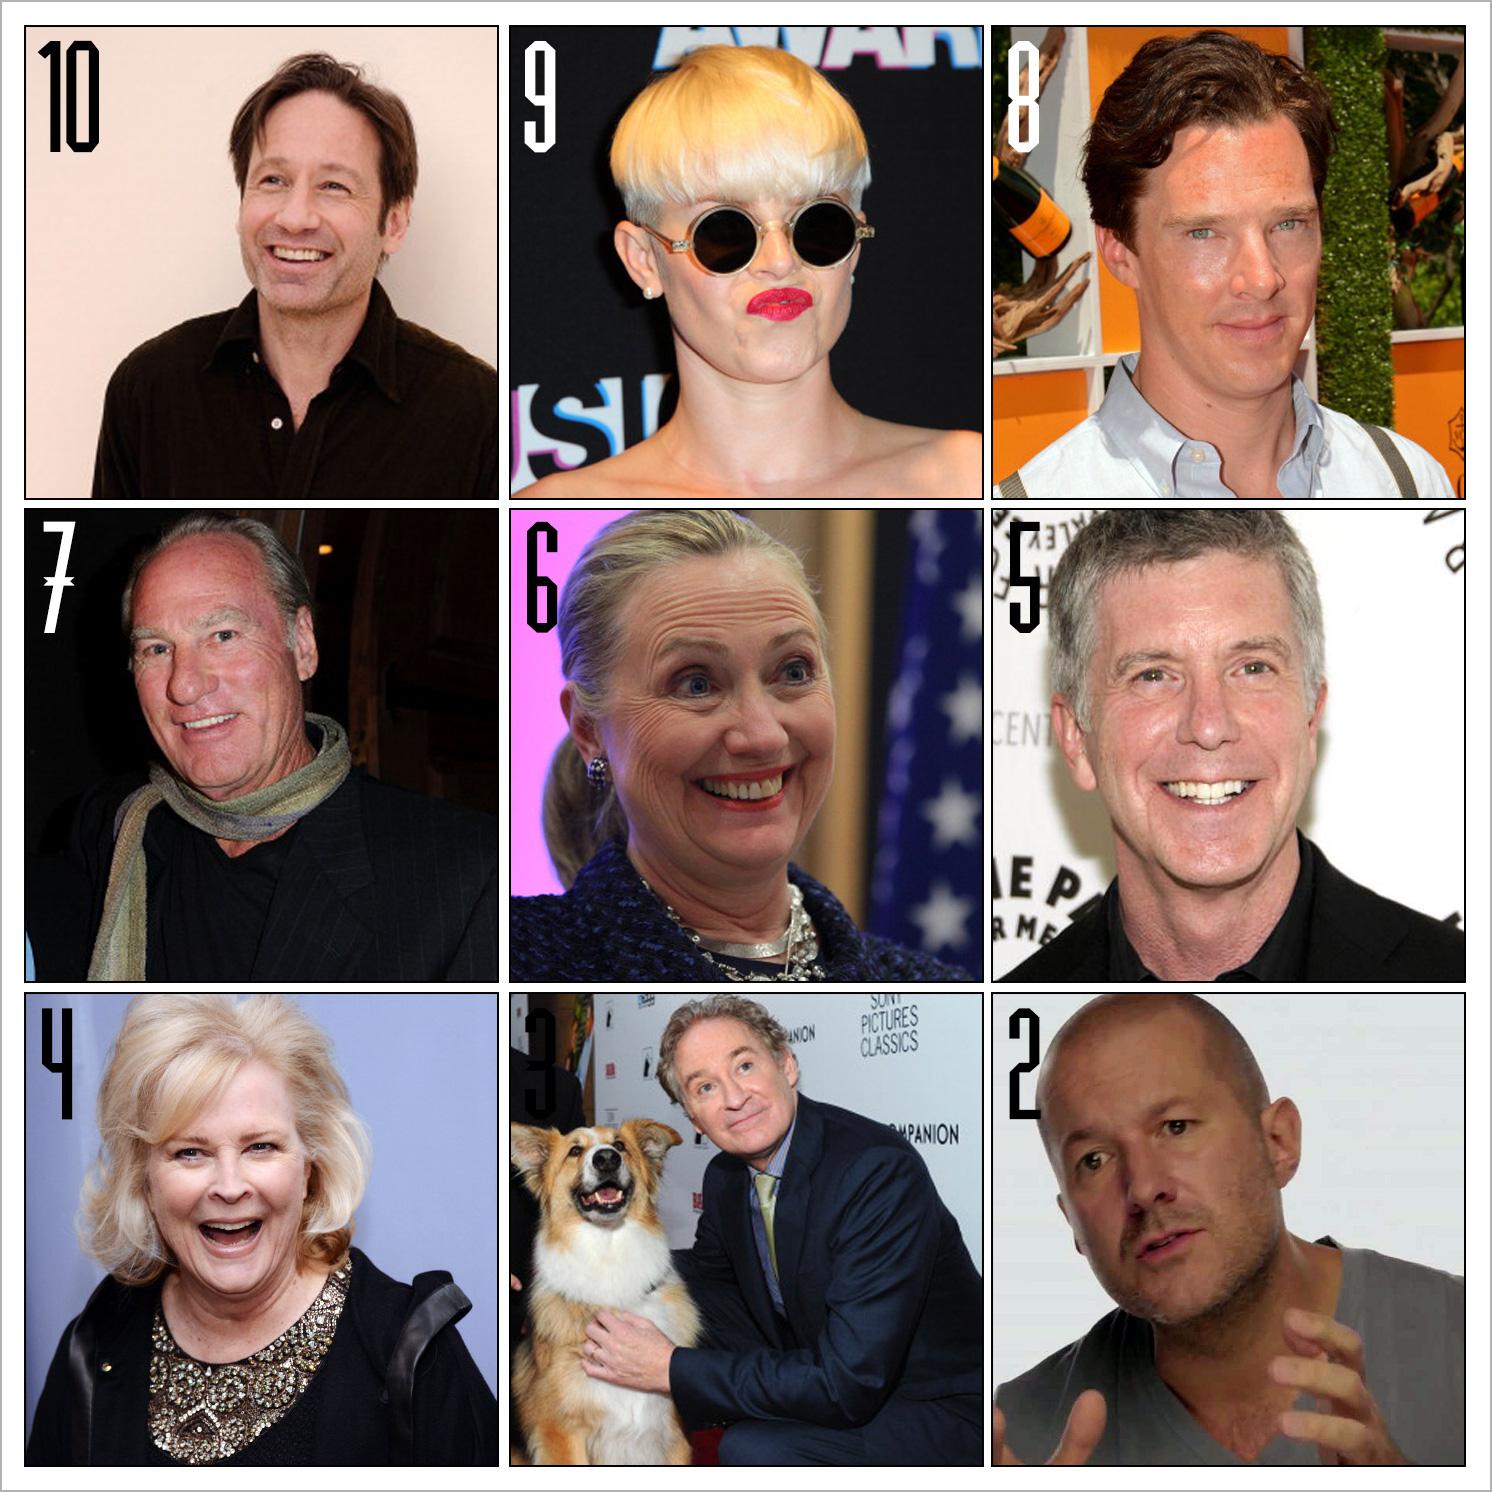 8. Benedict Cucumberpatch, 6. Hilary Clinton, 5. Tim Allen